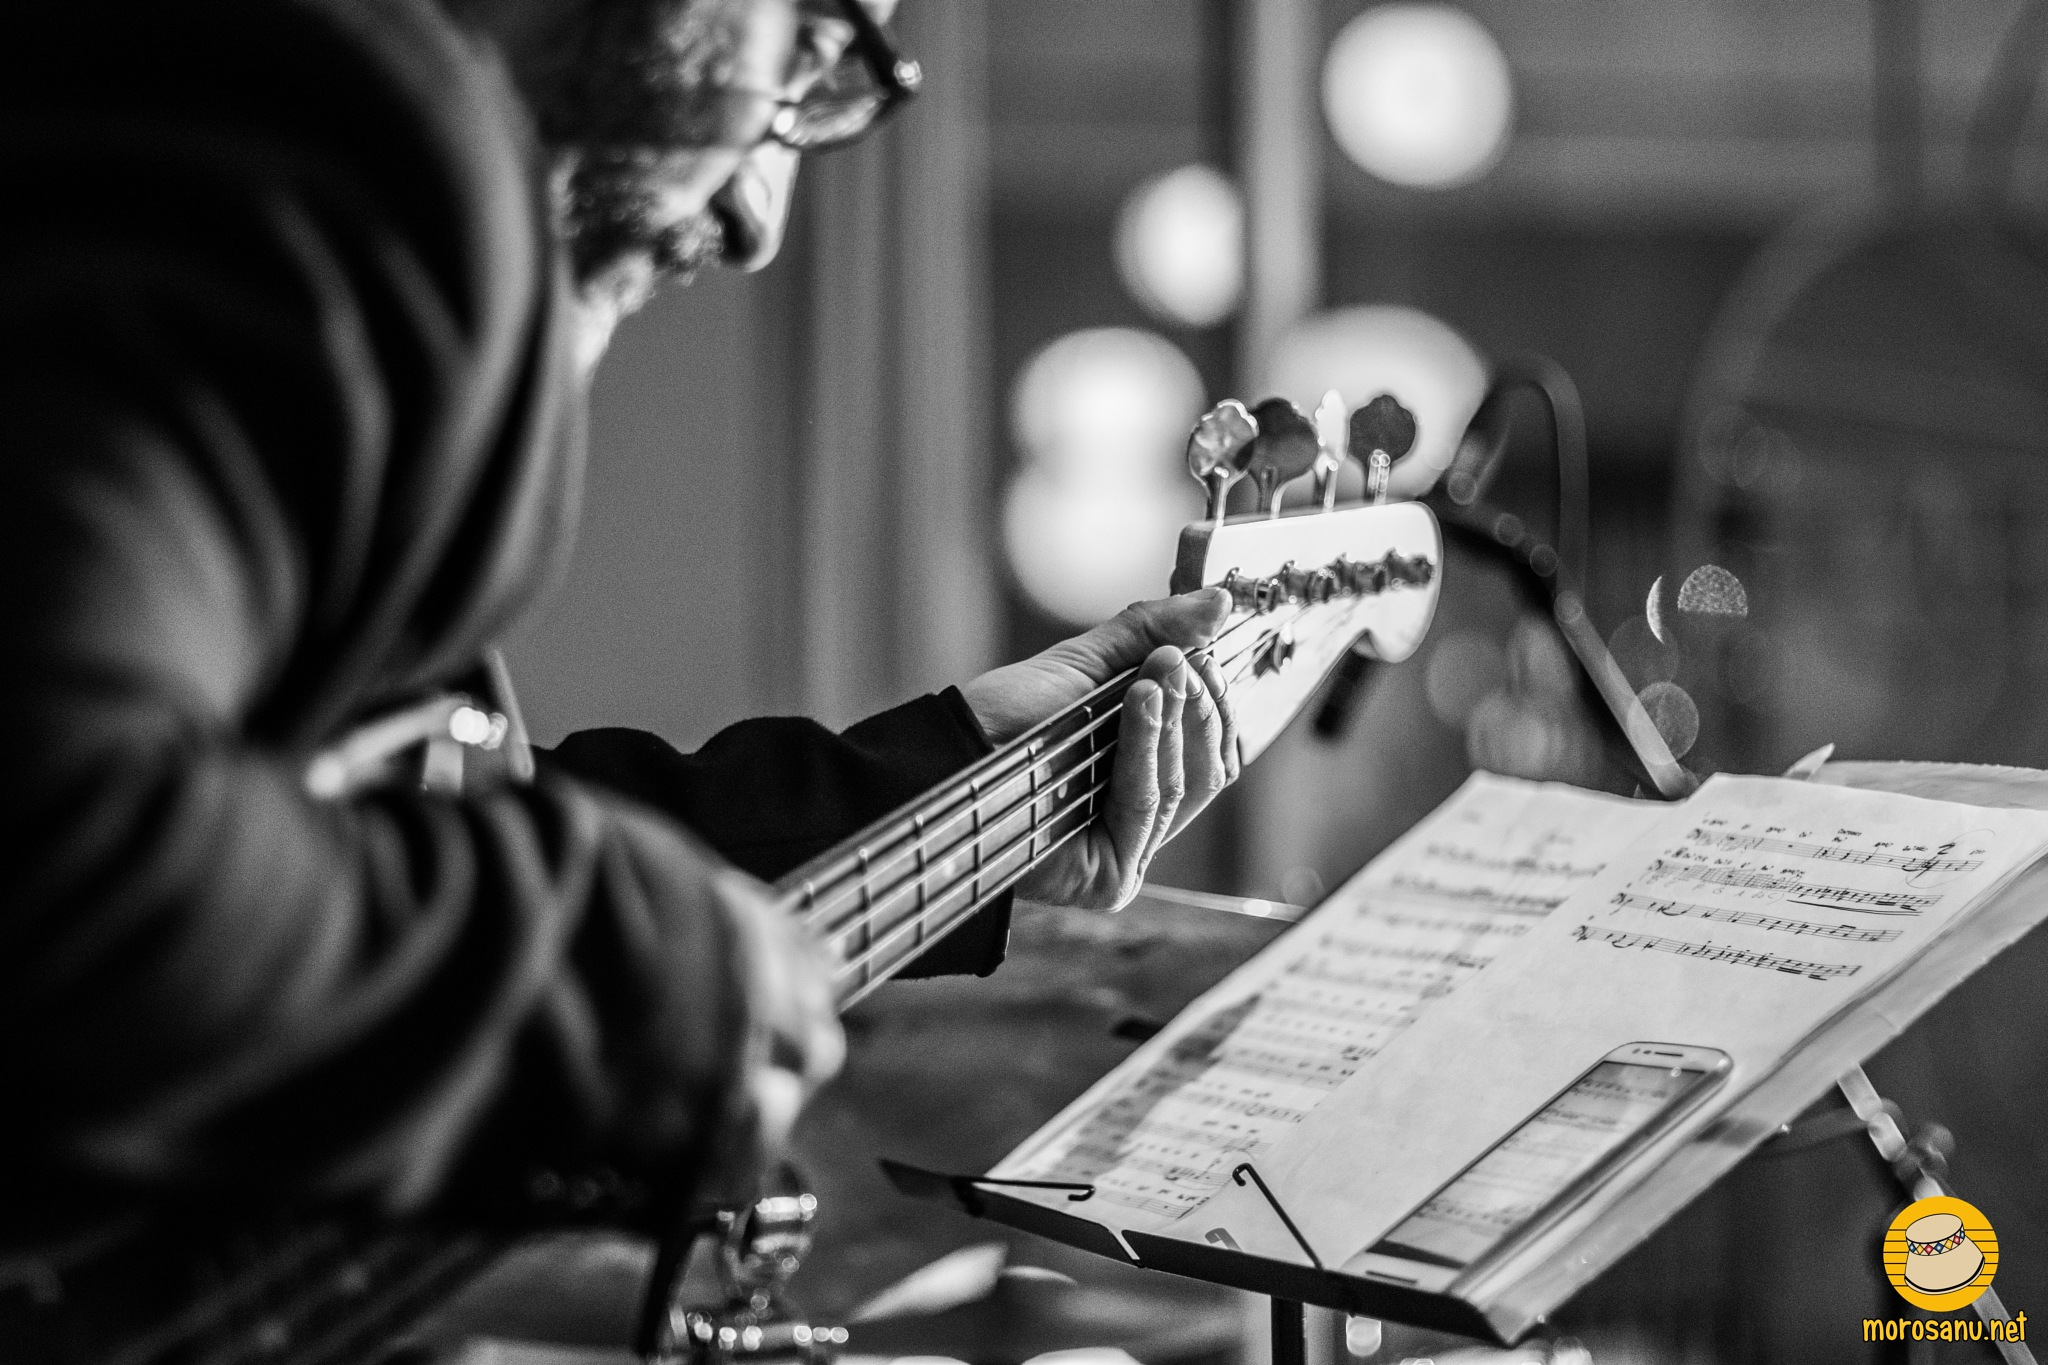 The bass player by AlexMara